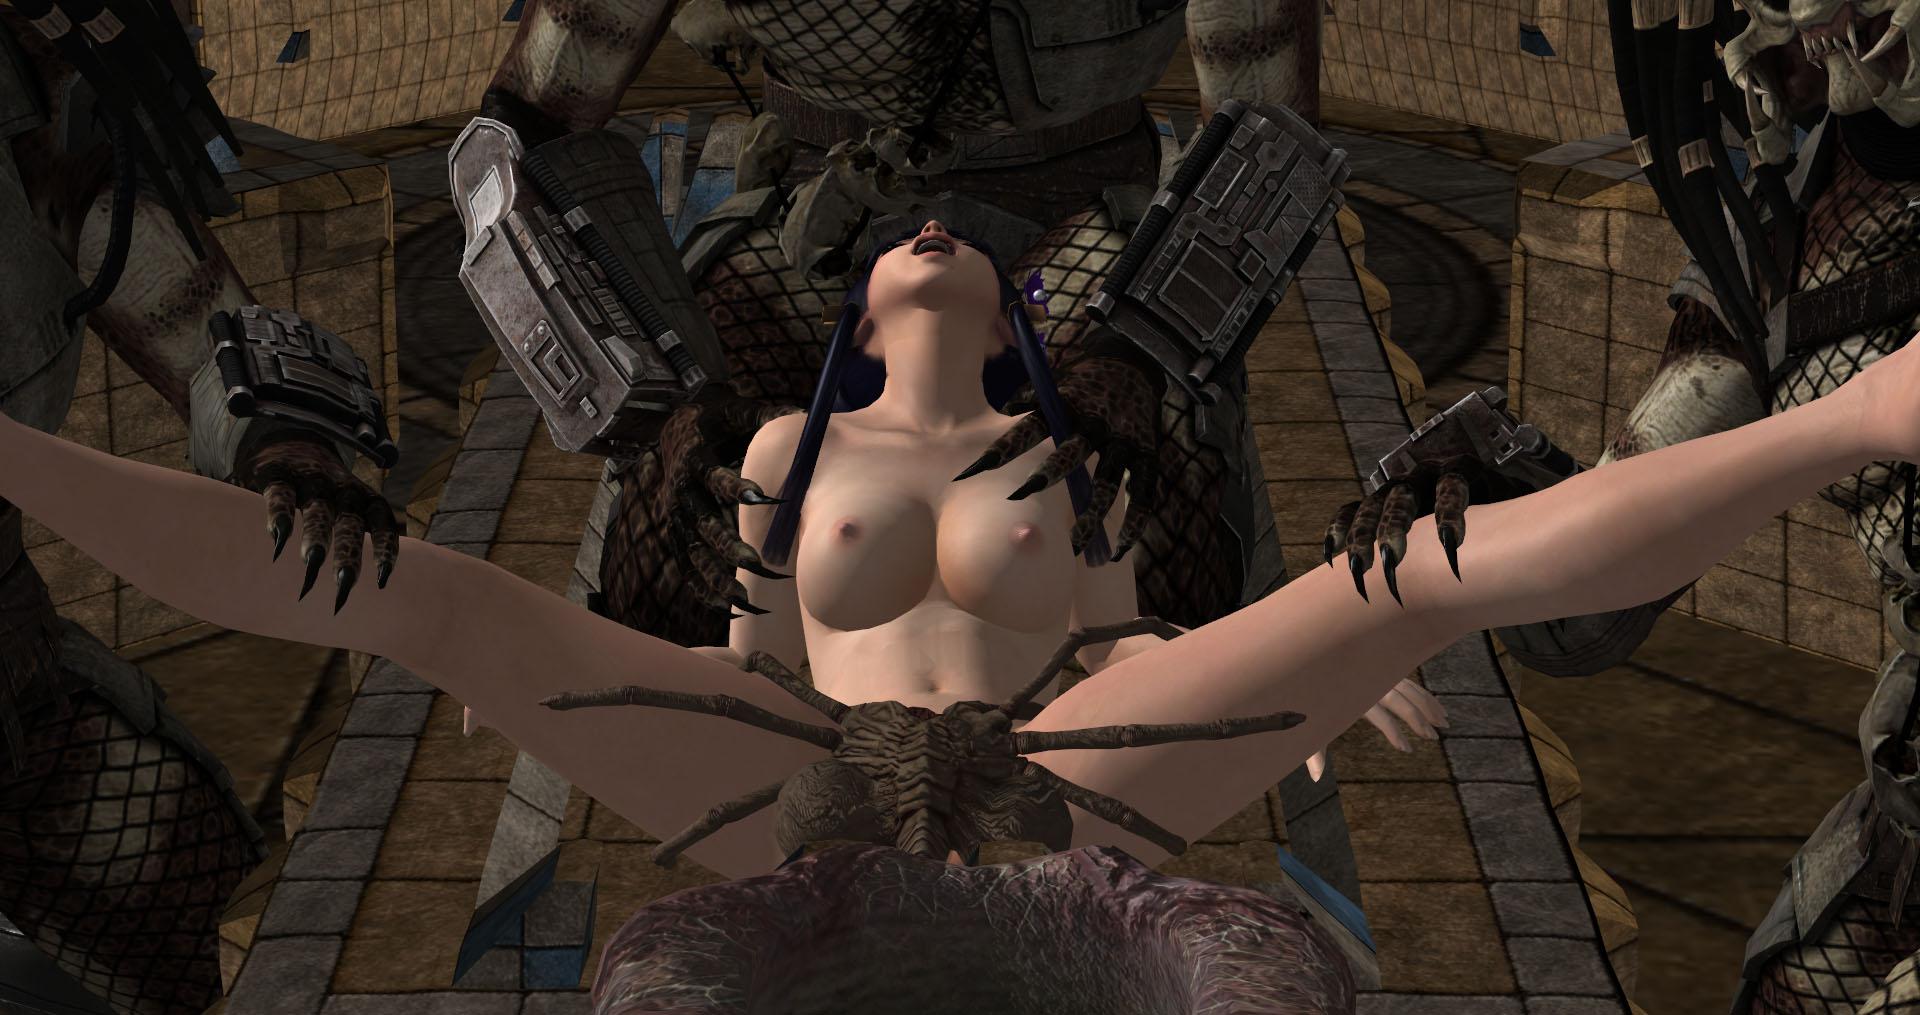 nyotengu_sacrifice_to_pussy_hugger_0067_layer_19_by_bitemonsters-dbgzclg.jpg